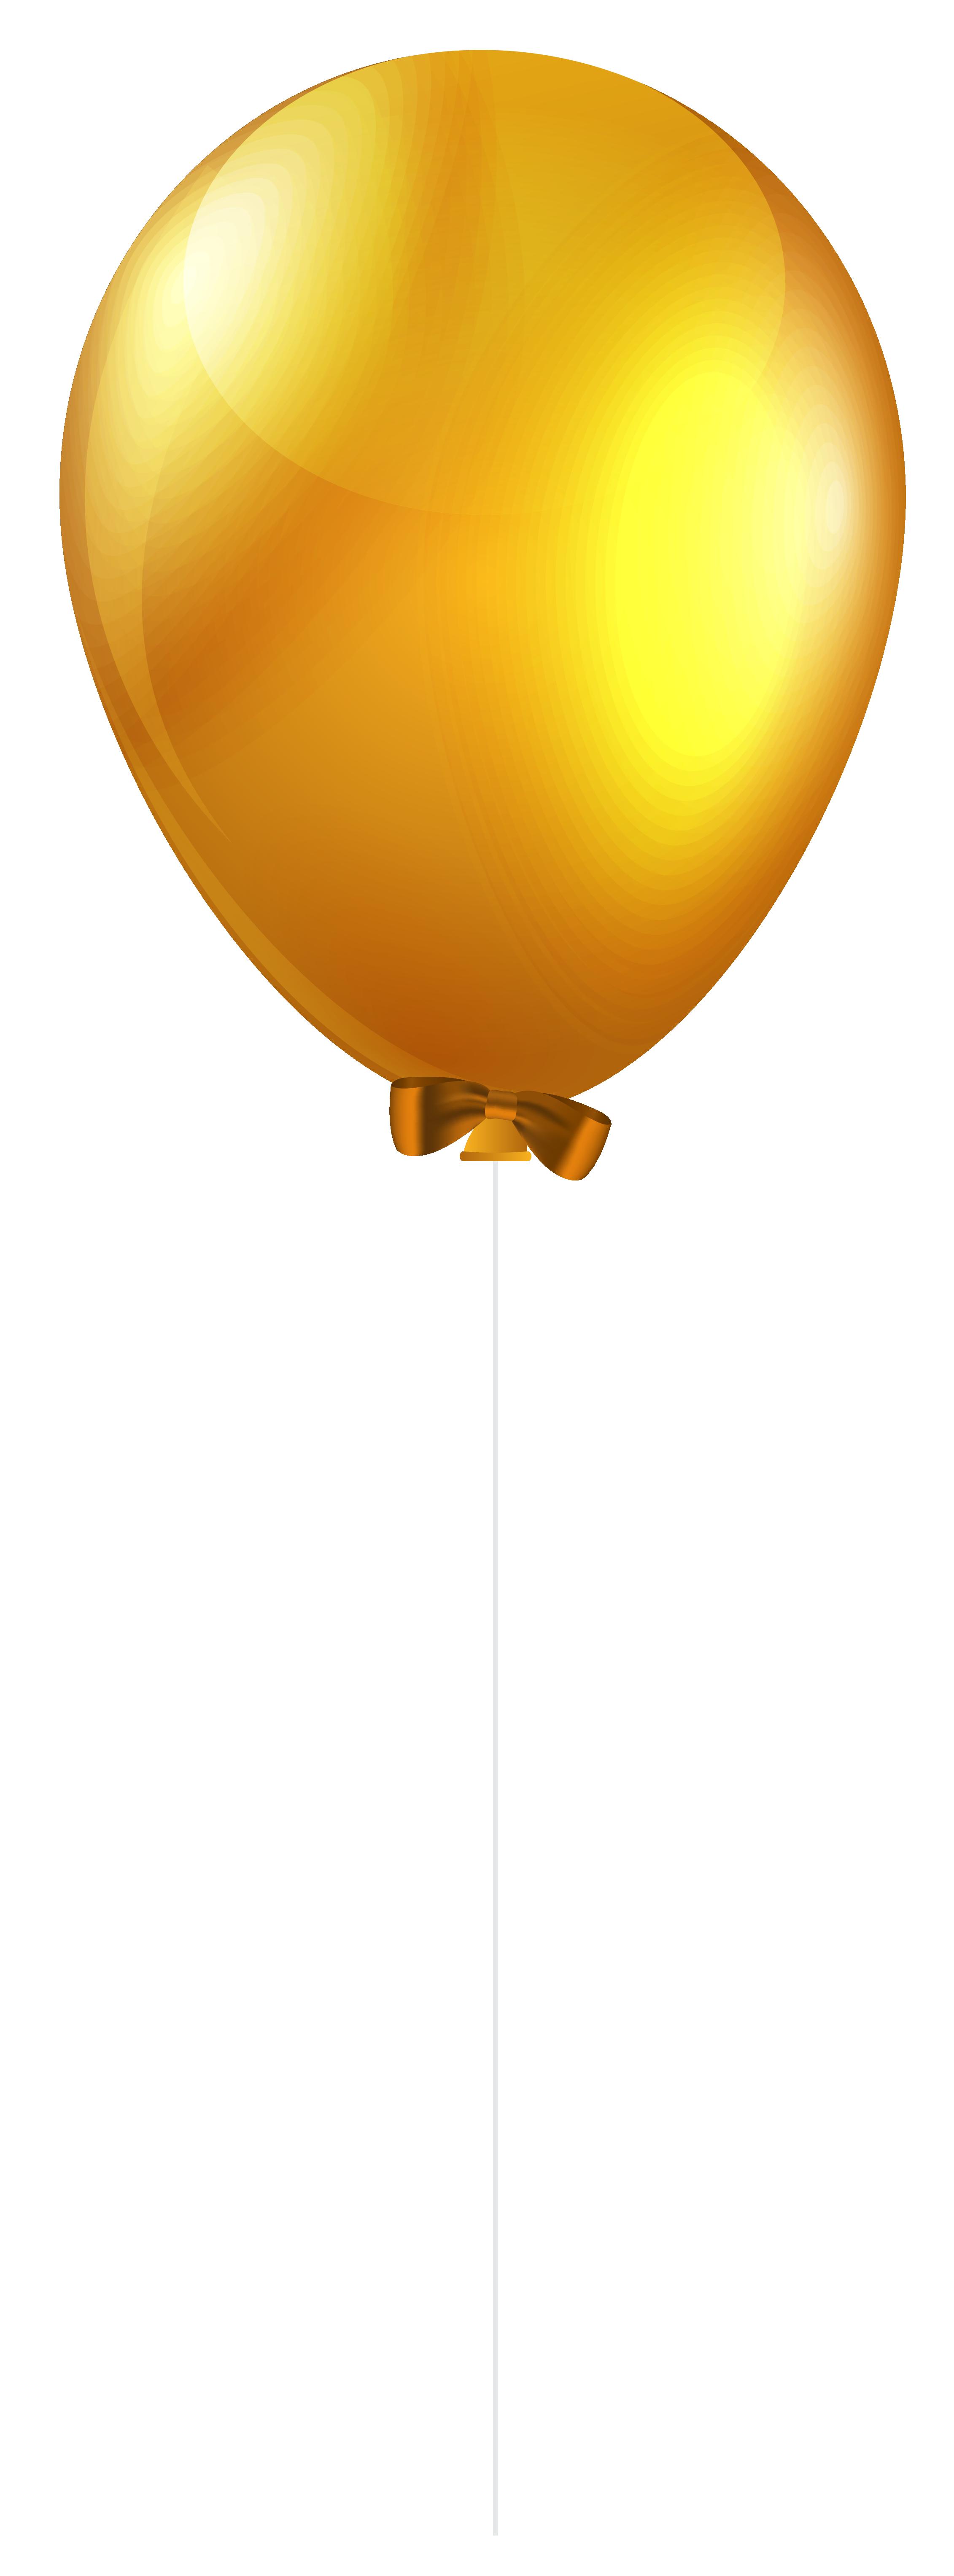 Clipart balloon spring. Yellow single png clip